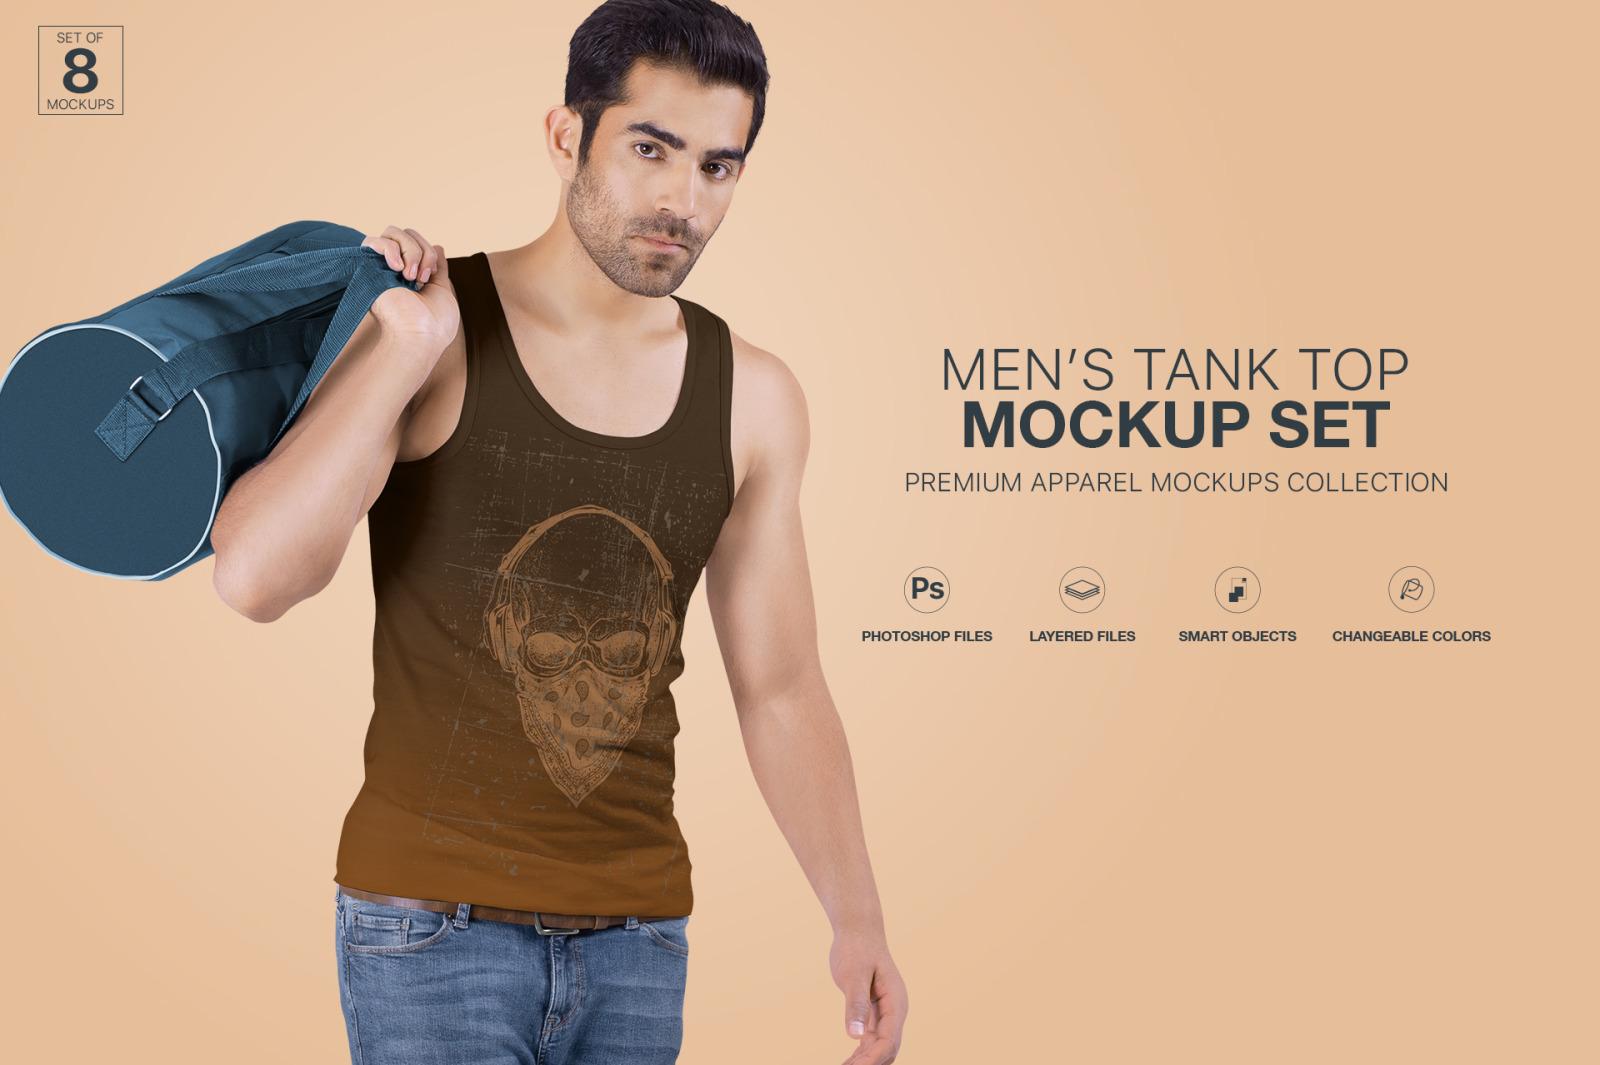 Men's Tank Top Mockup Set